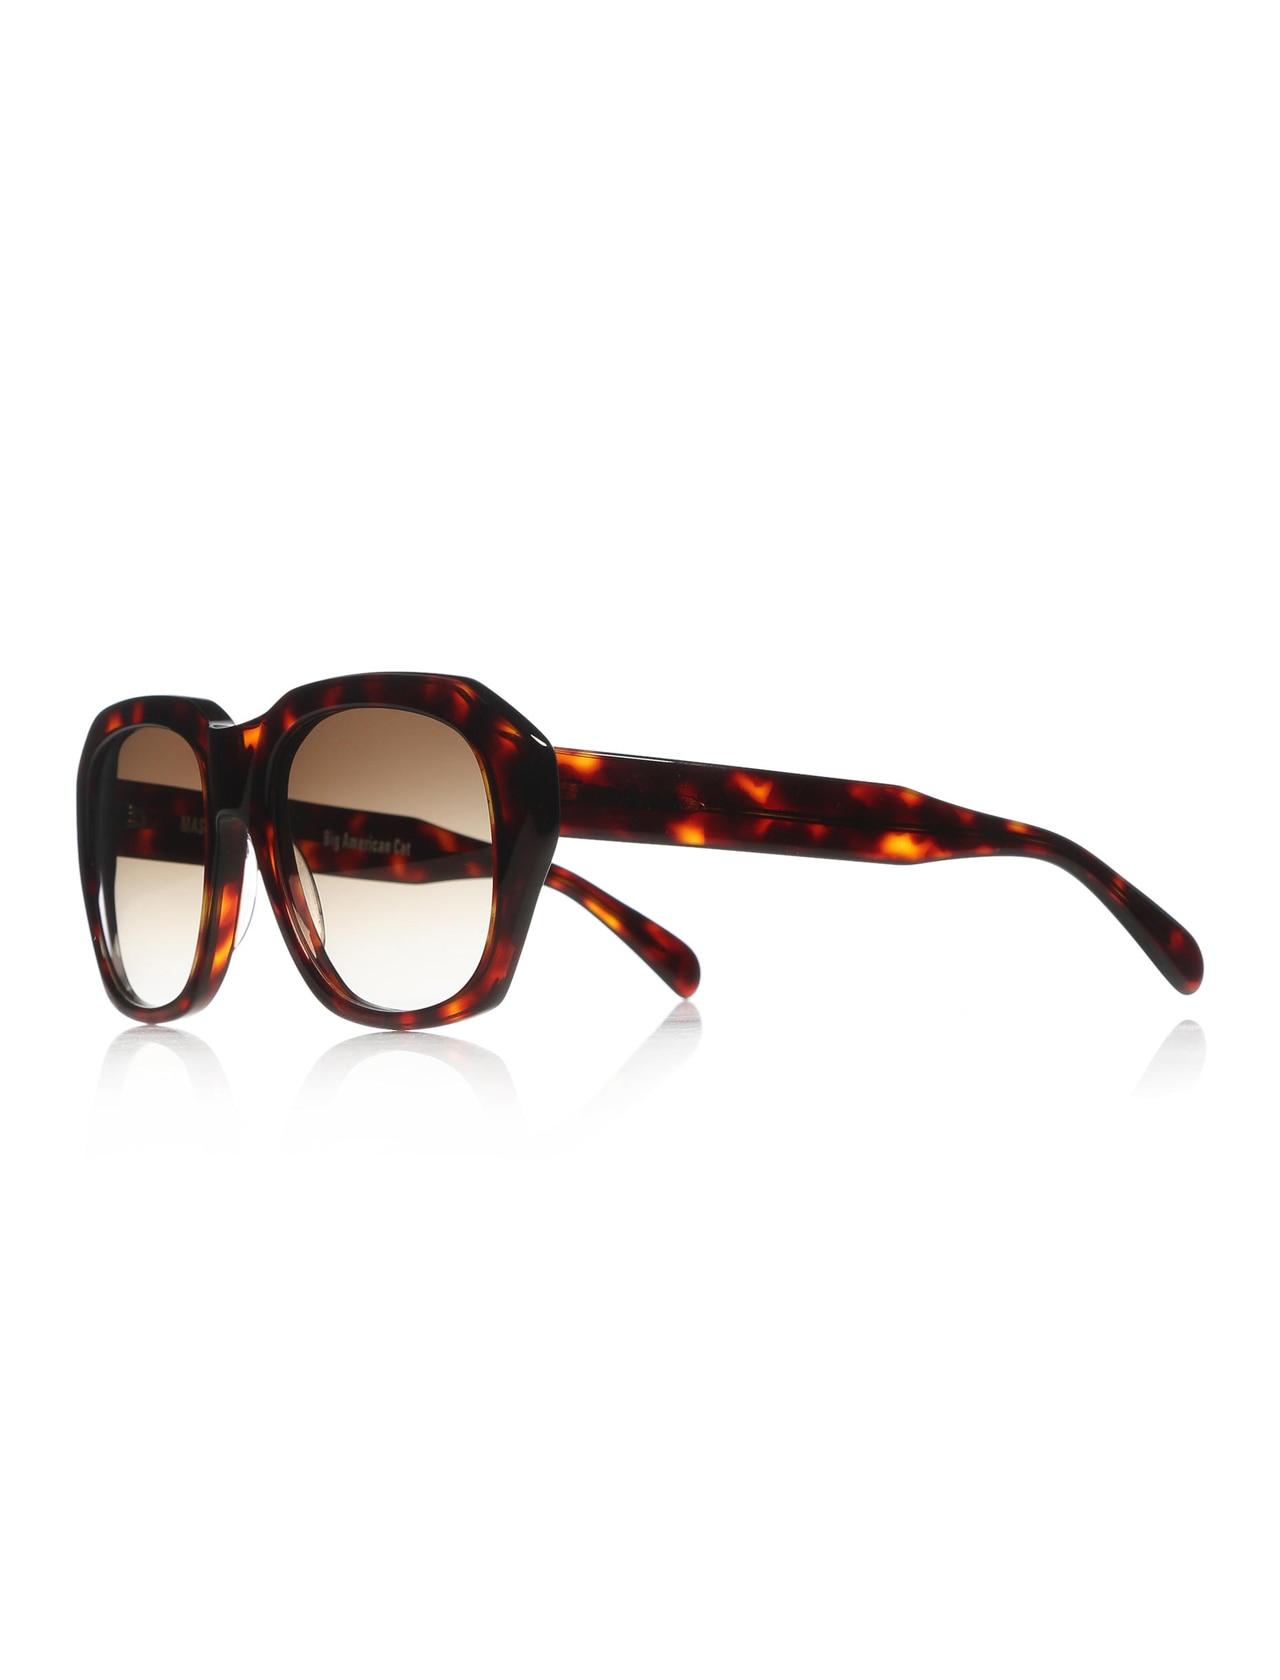 Women's sunglasses msd 2955 132 bone Brown organic square square 54-20-140 massada